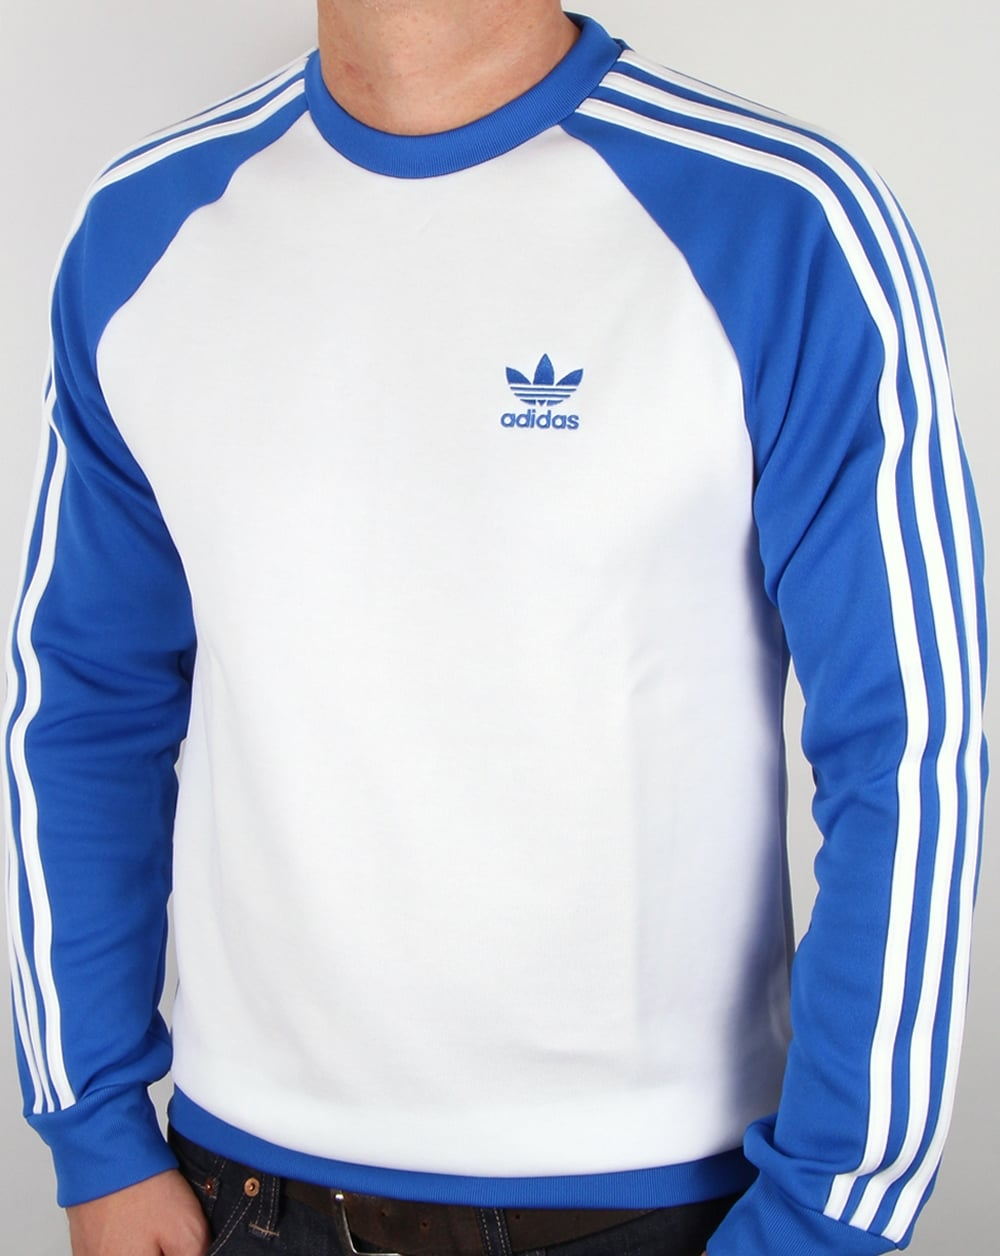 co uk Sweatshirt Adidas Blue Mens Thehampsteadfactory FTJK1cl